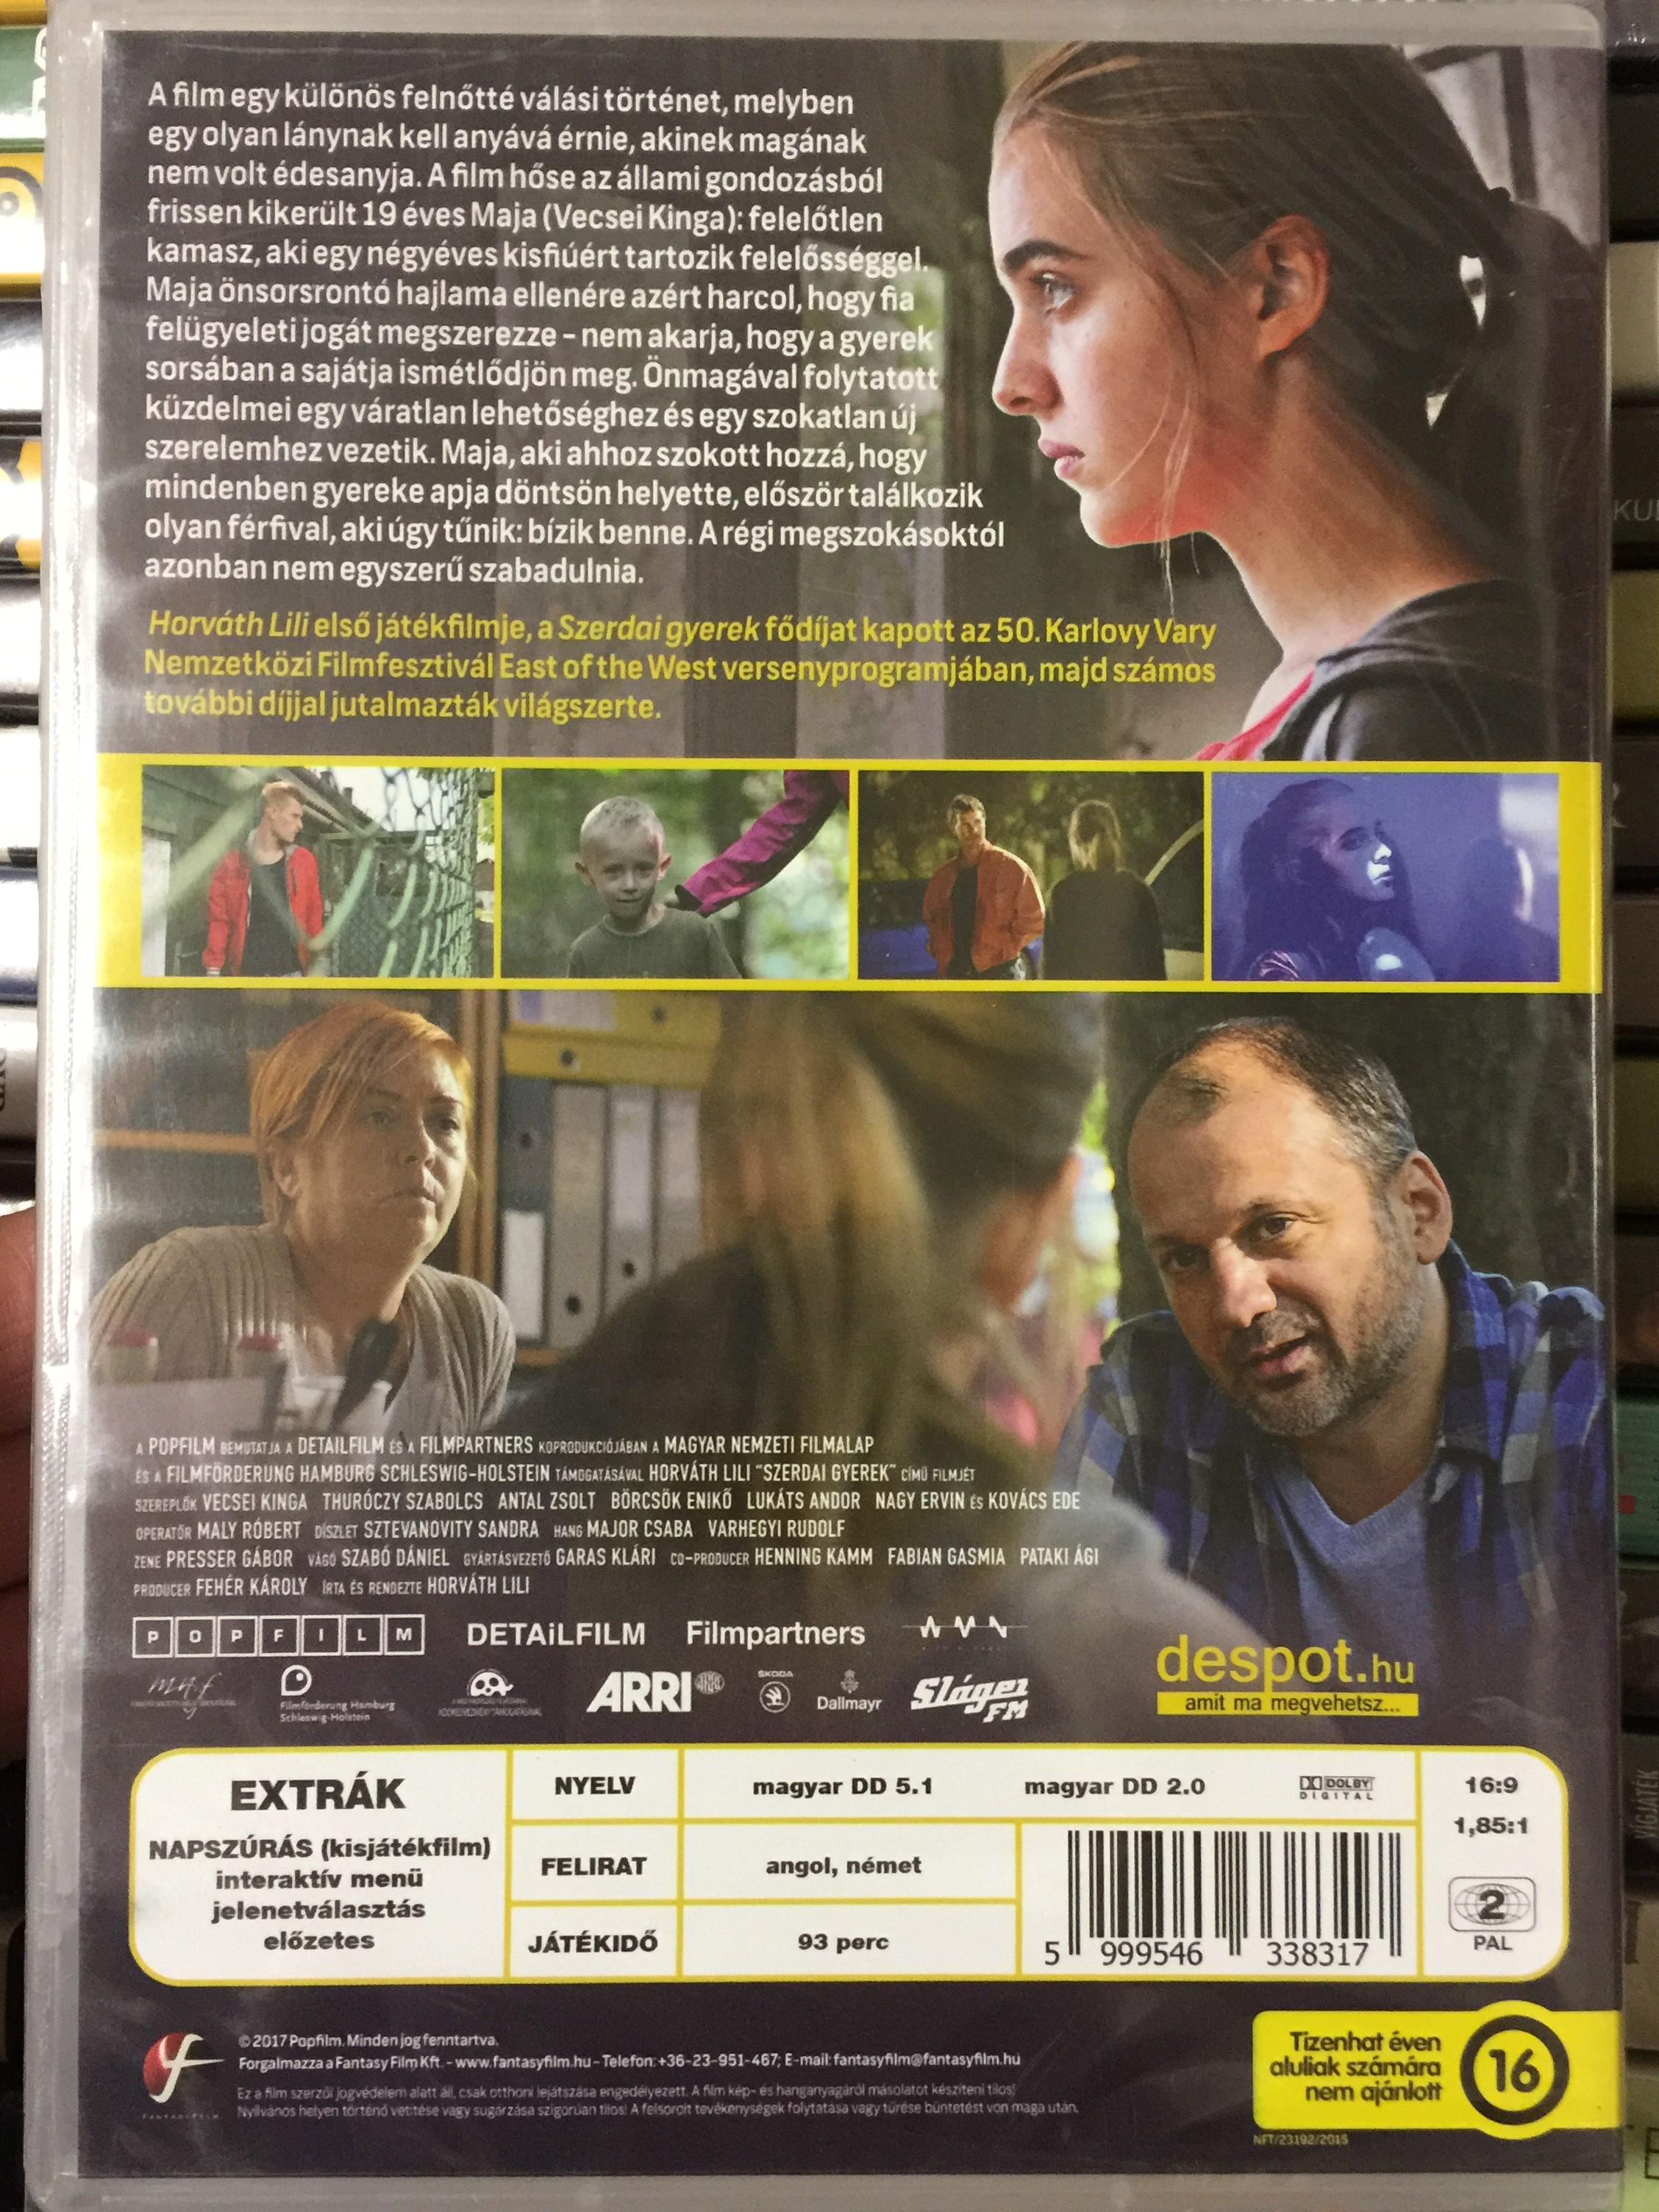 szerdai-gyerek-dvd-2014-wednesday-kid-directed-by-horv-th-lili-2.jpg